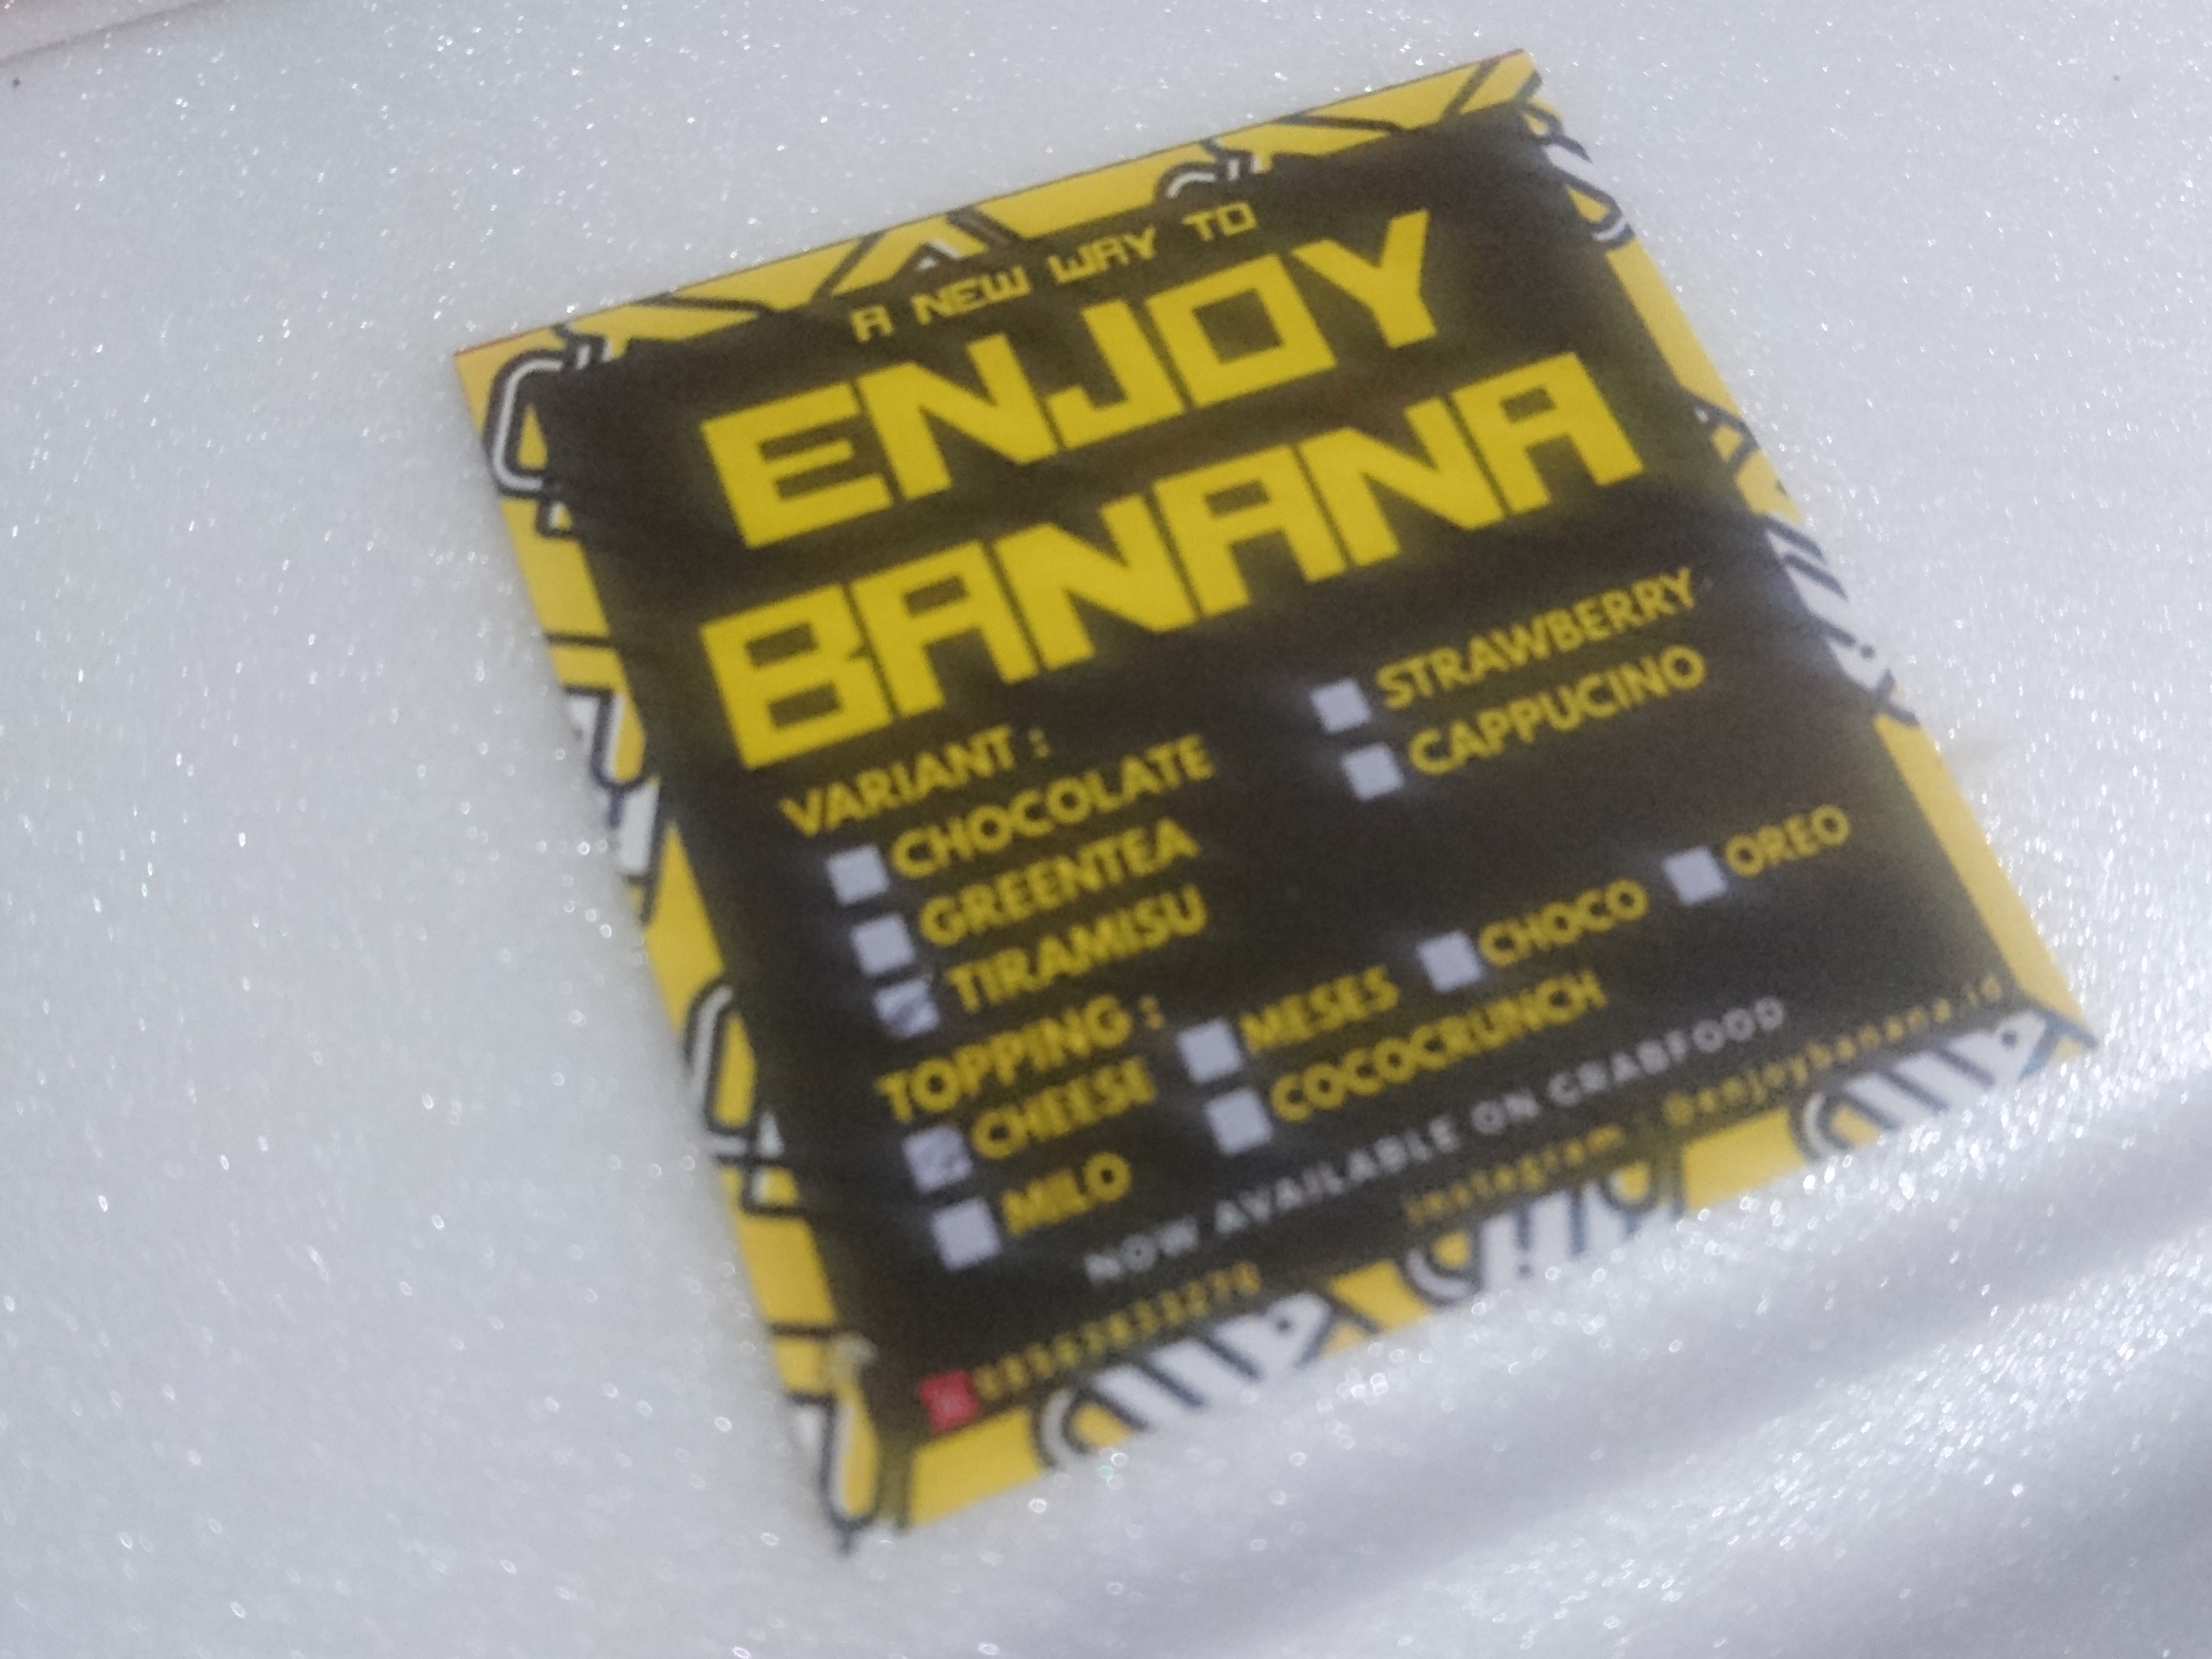 Logo Enjoy Banana, salah satu spesialis pisang nugget di Kota Malang. (Foto: Riska Suci Rahmawati)